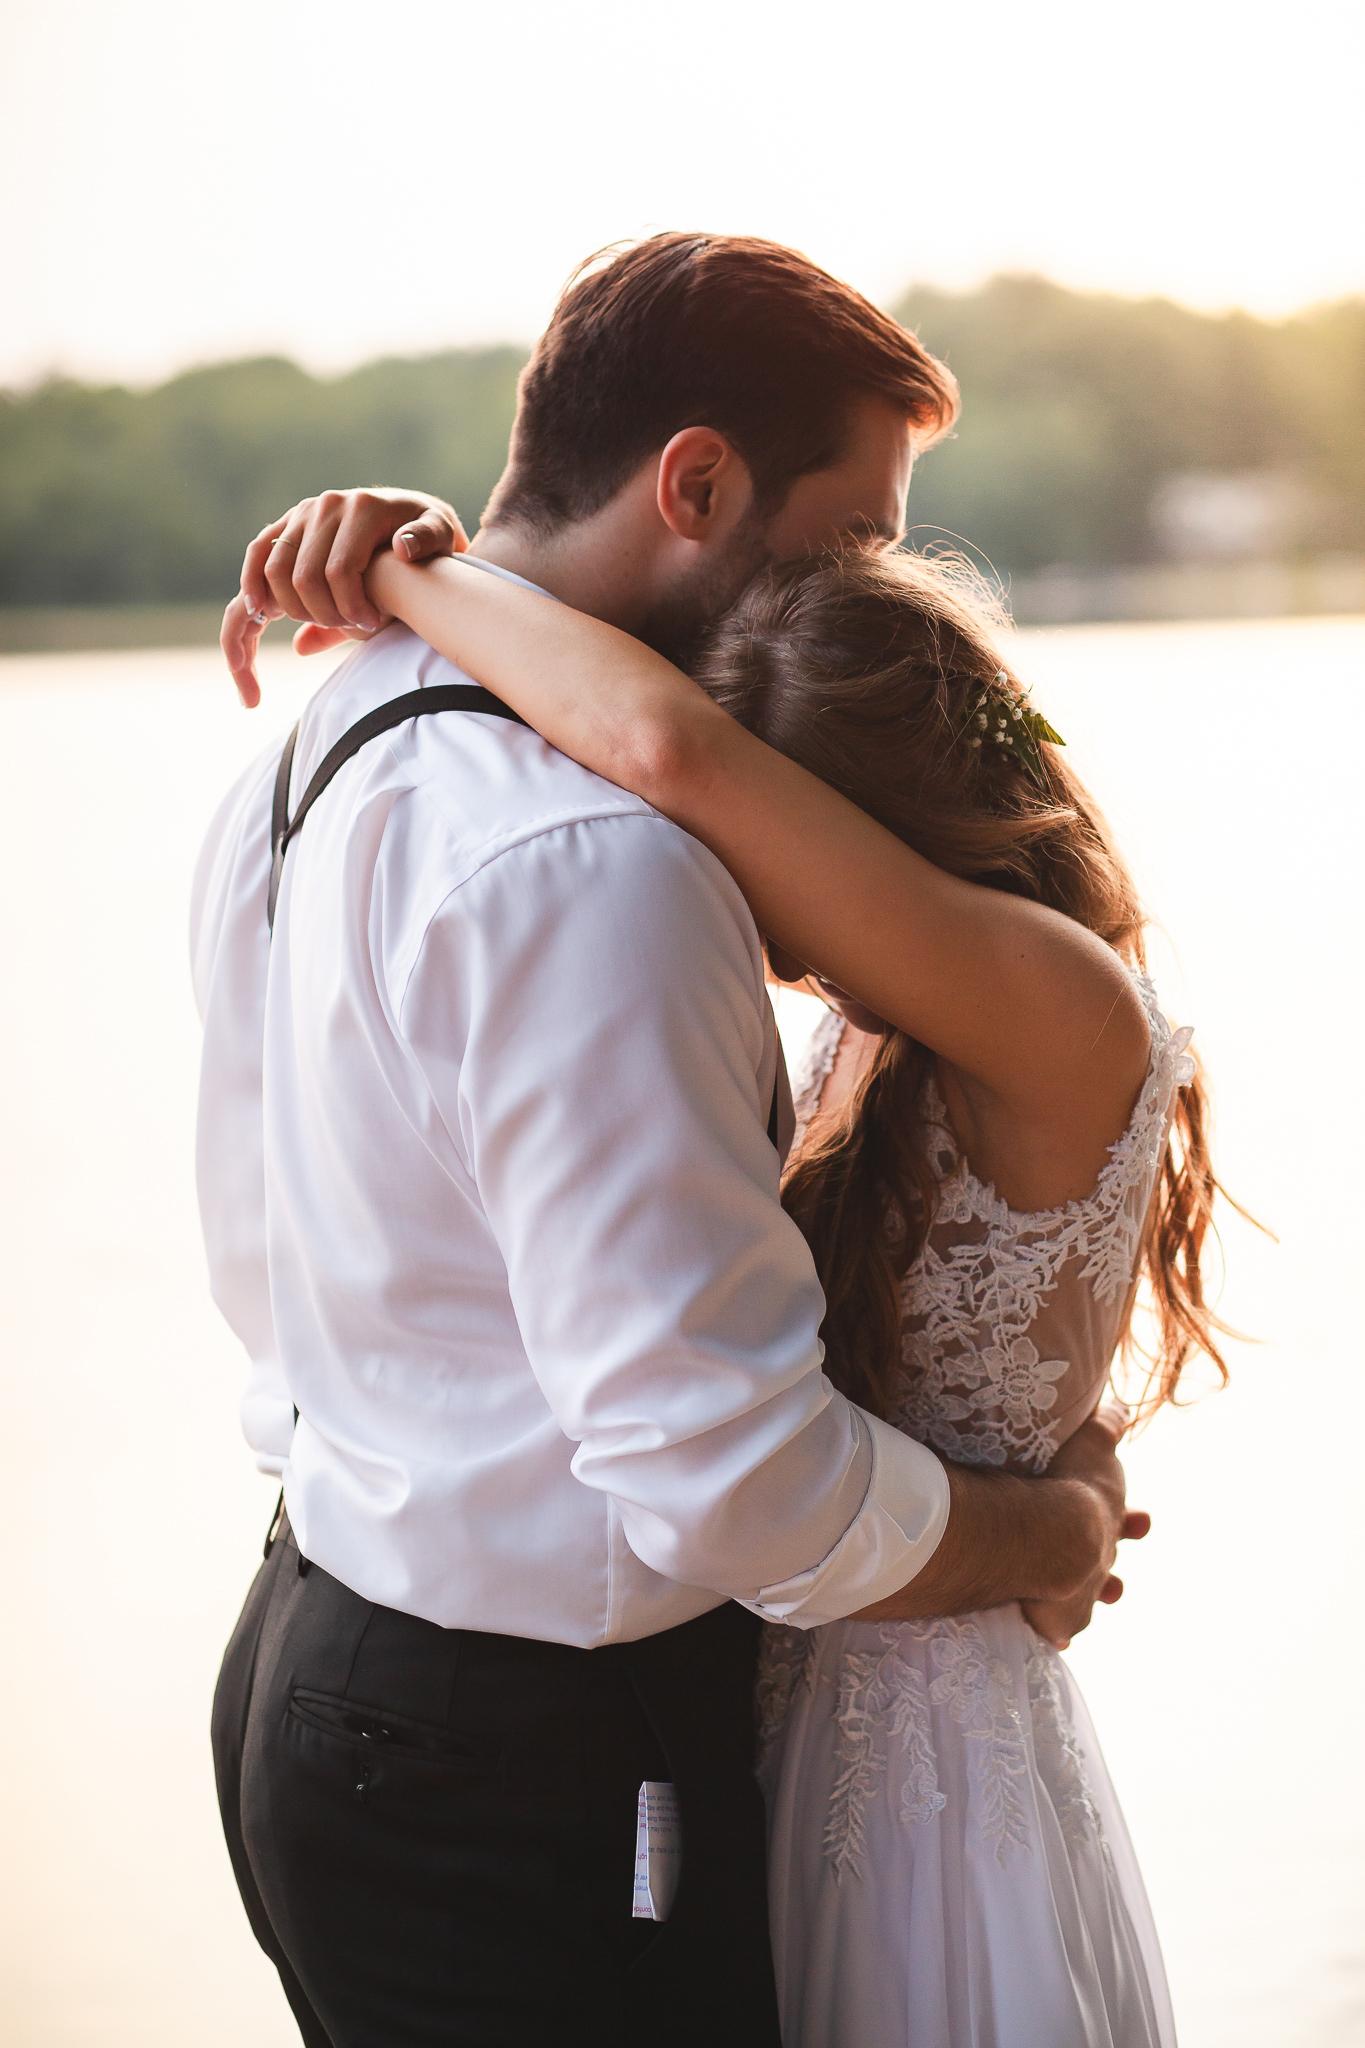 Amy D Photography- Bride and Groom- Wedding Poses- Muskoka Wedding- Barrie Wedding Photographer- Best Wedding Photographer- Muskoka Wedding Photography- Bride Pose- Groom Pose-70.jpg